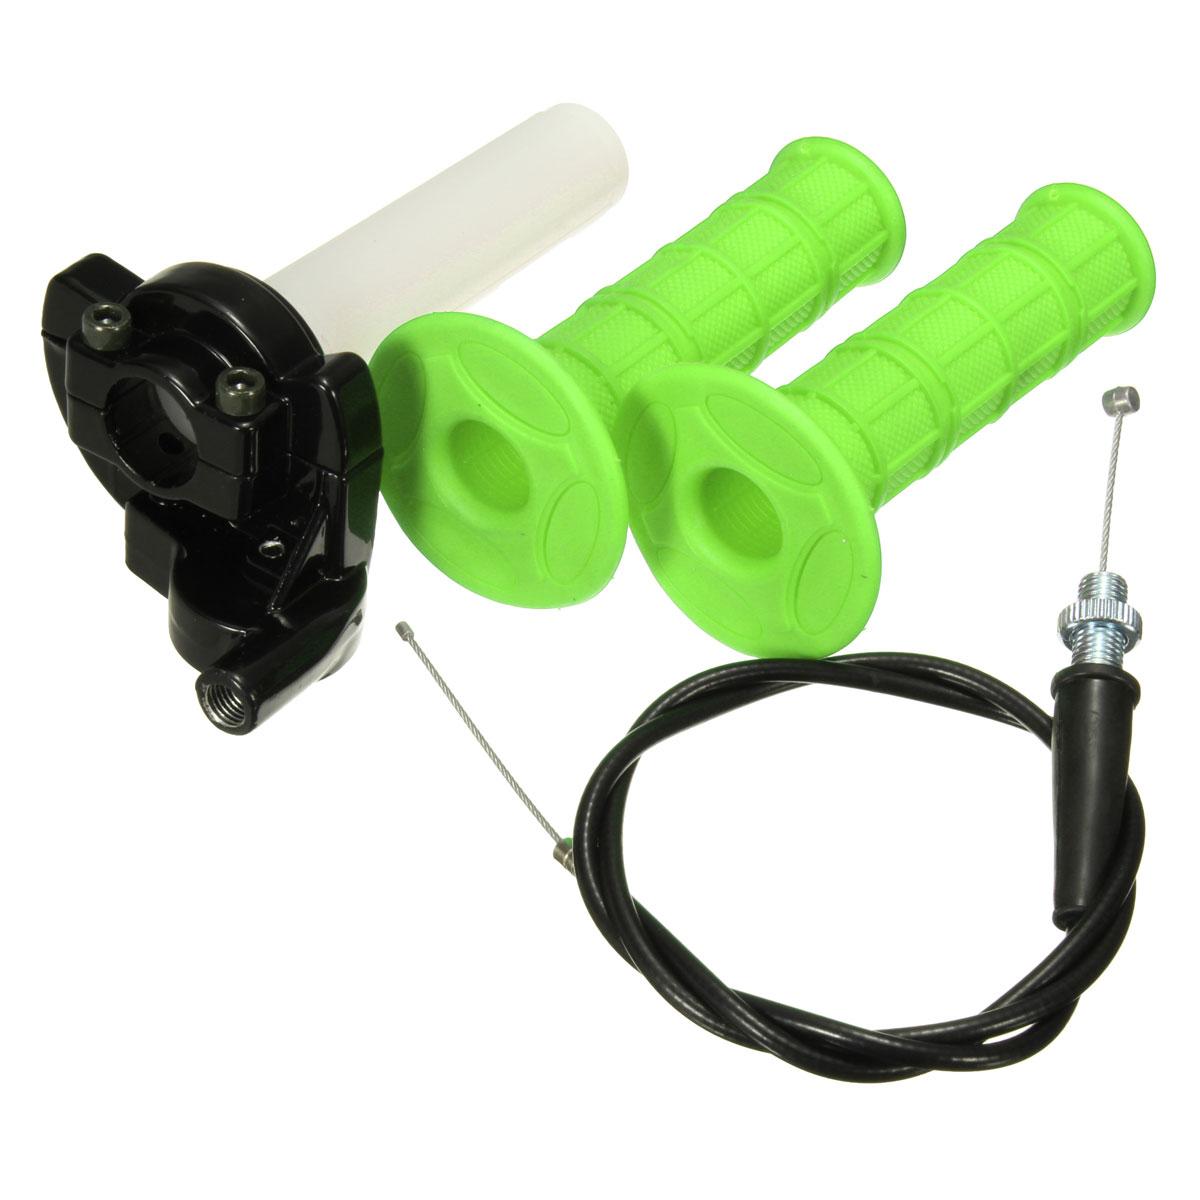 "MATCC Quick Action Throttle Grip Twist Cable For 90 110 125cc ATV Pit Dirt Bike 22mm 7/8"" Handlebar Green"